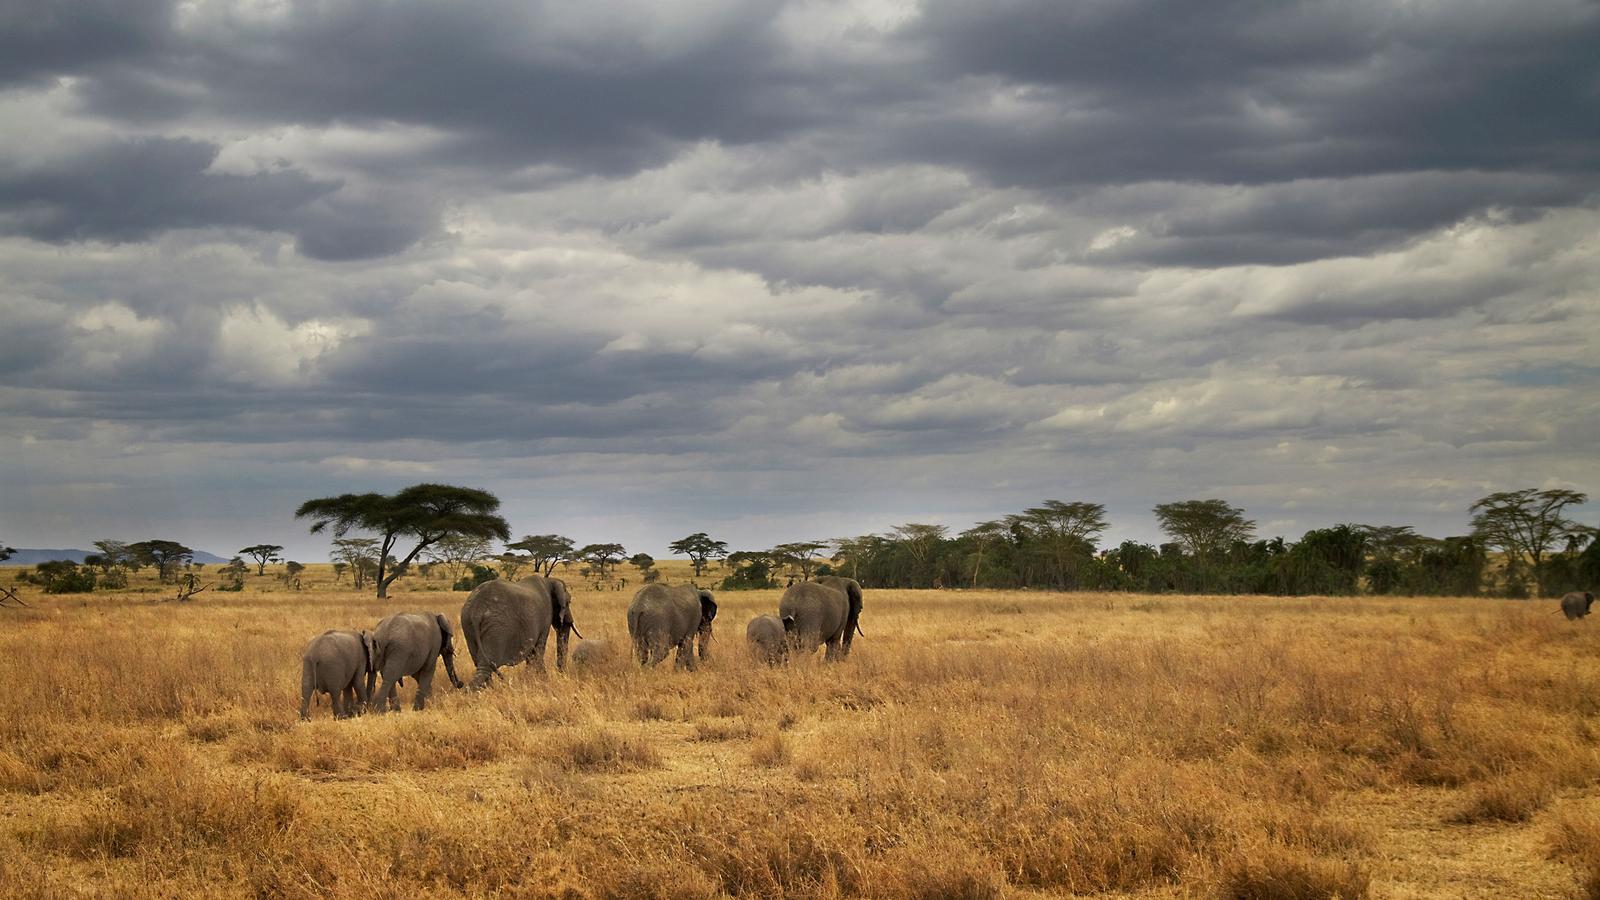 Masai & tansania camping safari in tansania afrika g adventures